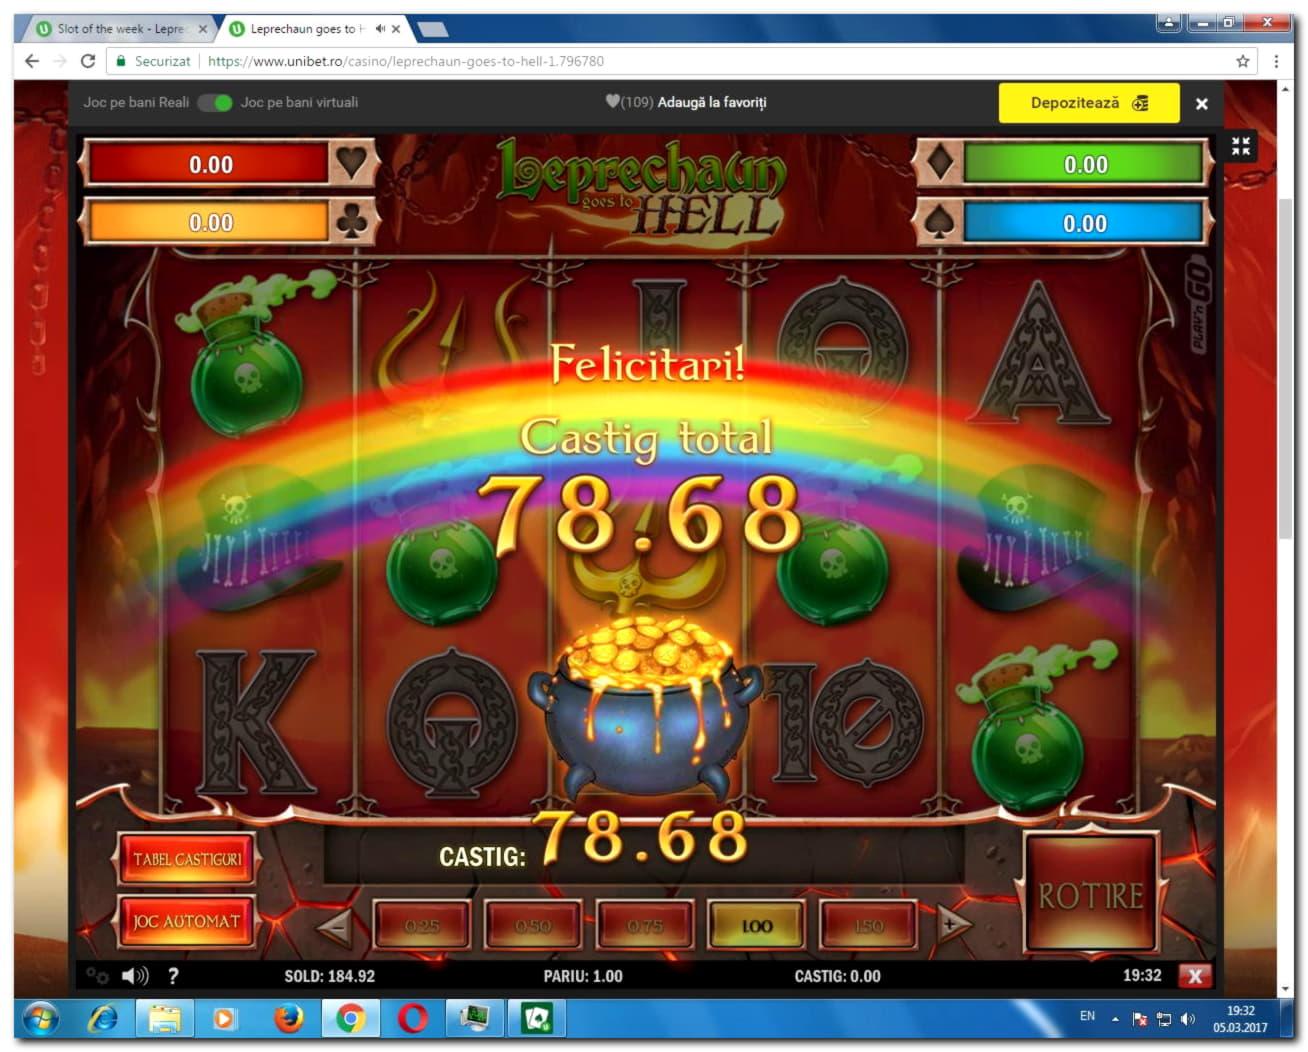 EURO 4490 No deposit bonus at Slots Billion Casino